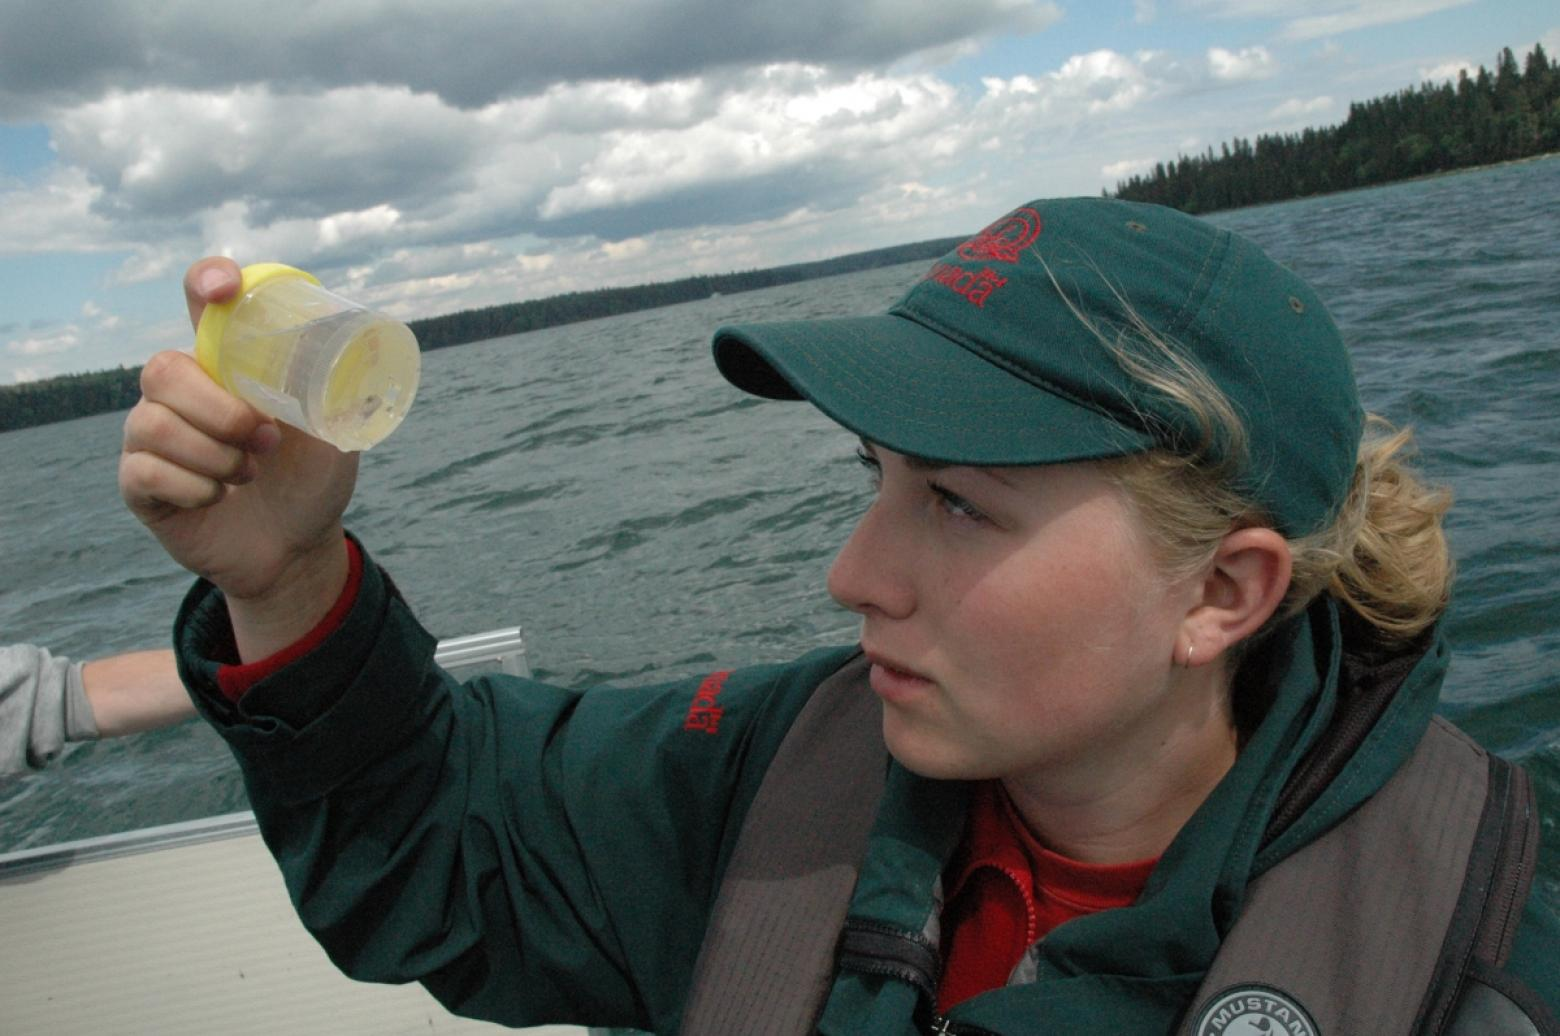 Park ranger conducting monitoring activities © Parks Canada